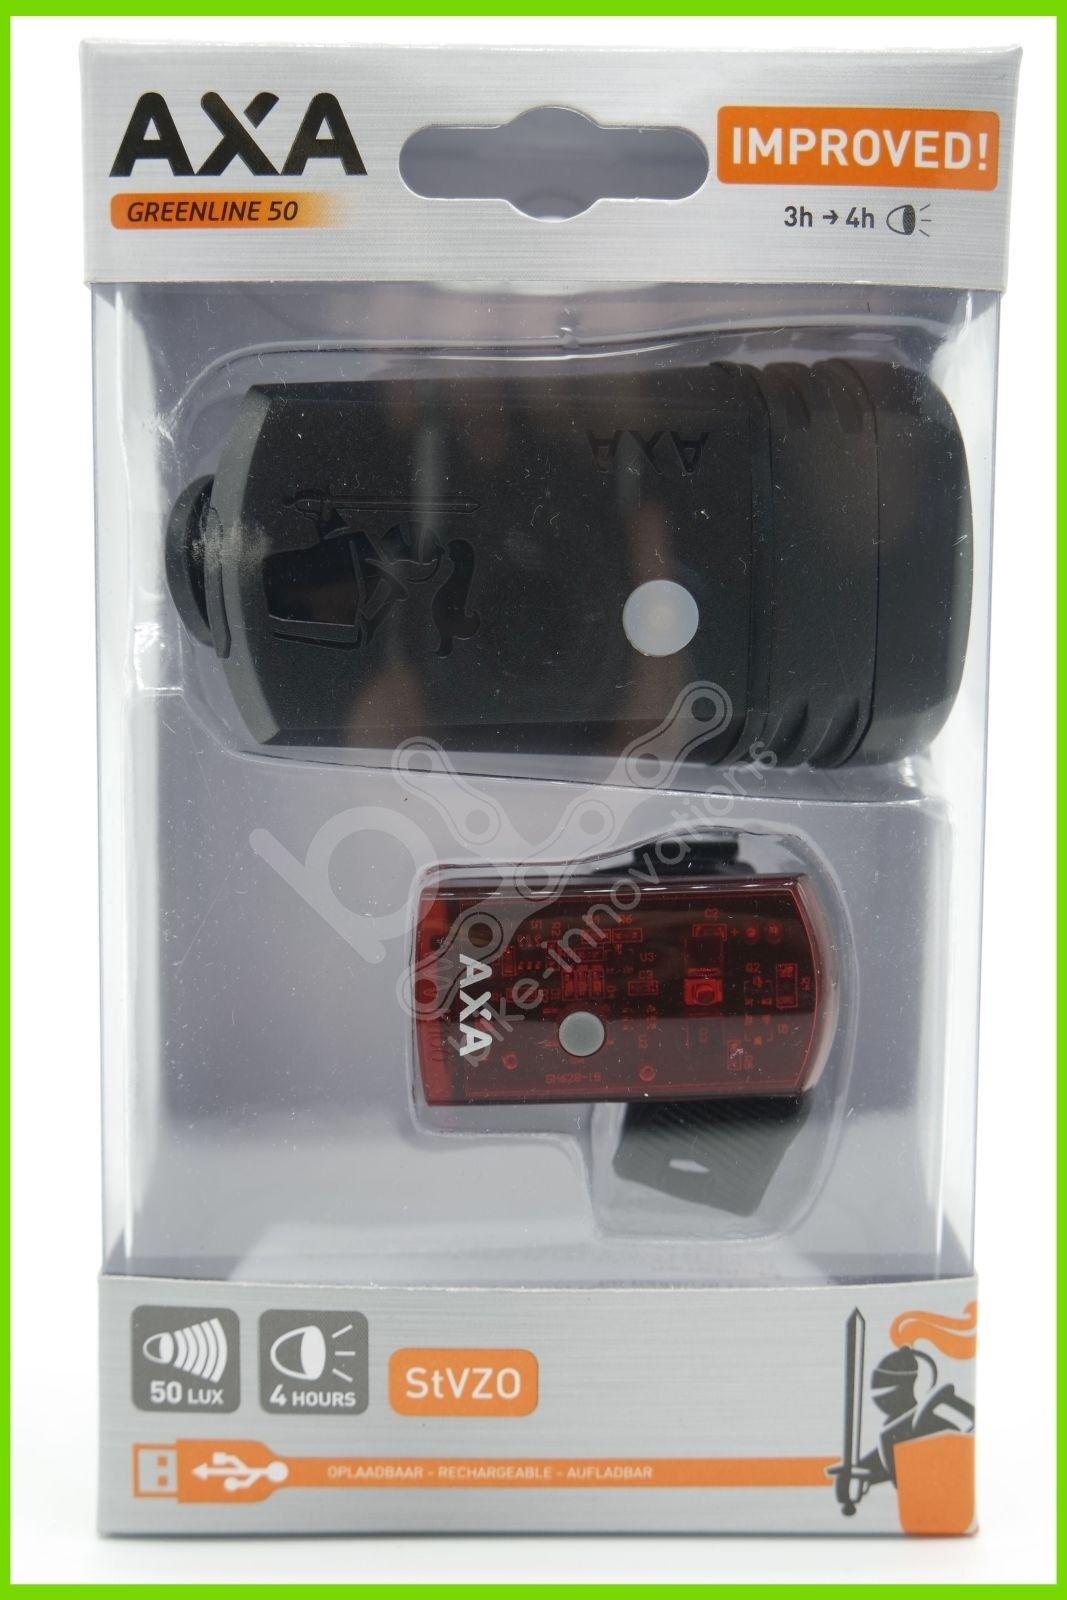 AXA GrünLINE 50 LUX Fahrrad USB Akku Beleuchtungsset USB Fahrrad StVZO zugelassen LED 79c636